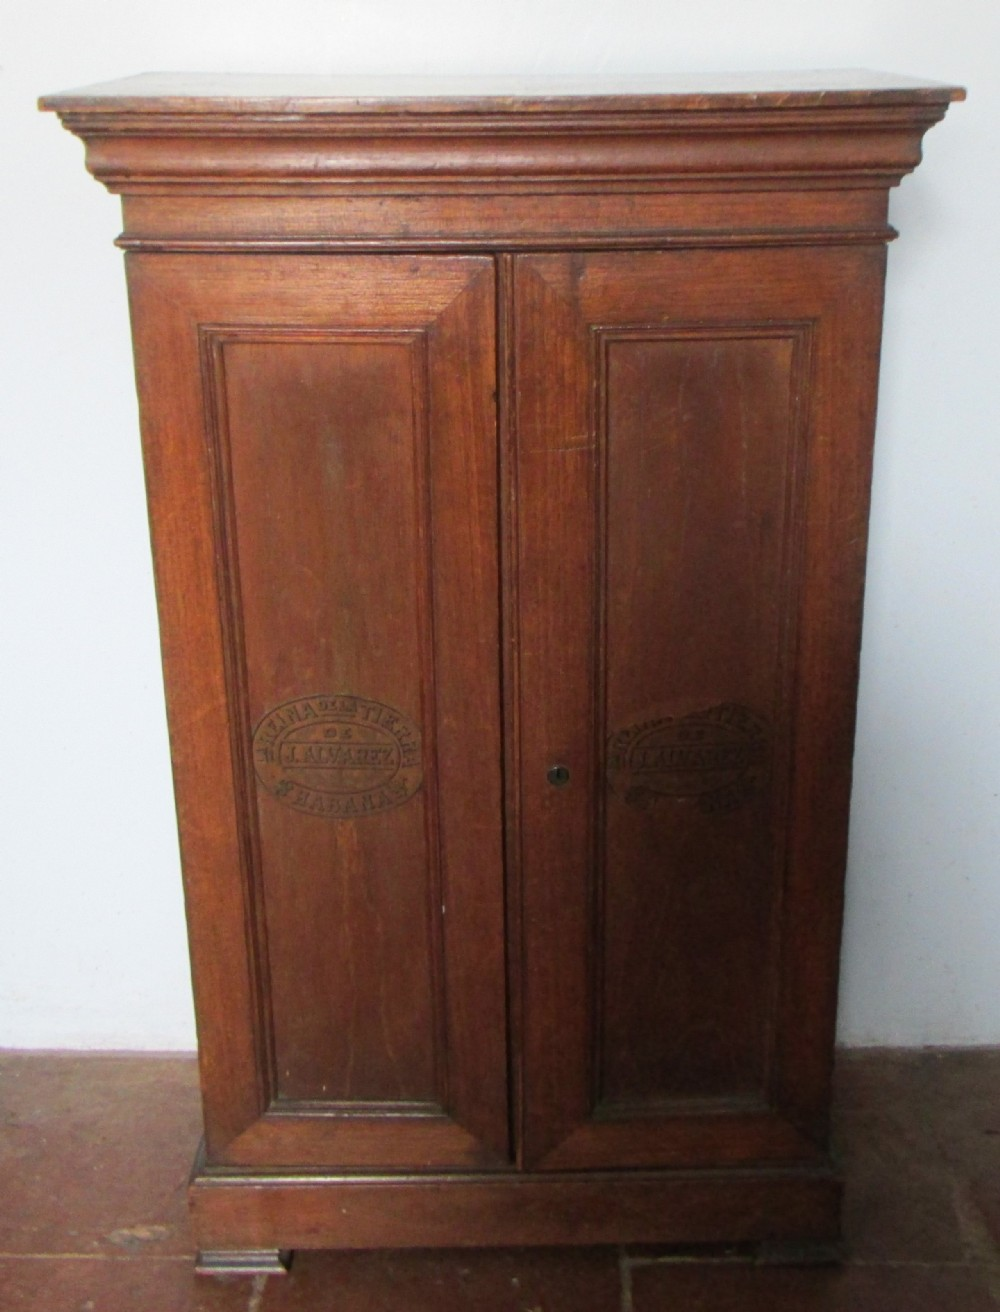 unusual victorian cuban cigar retail cabinet. antique photo - Unusual Victorian Cuban Cigar Retail Cabinet 348052